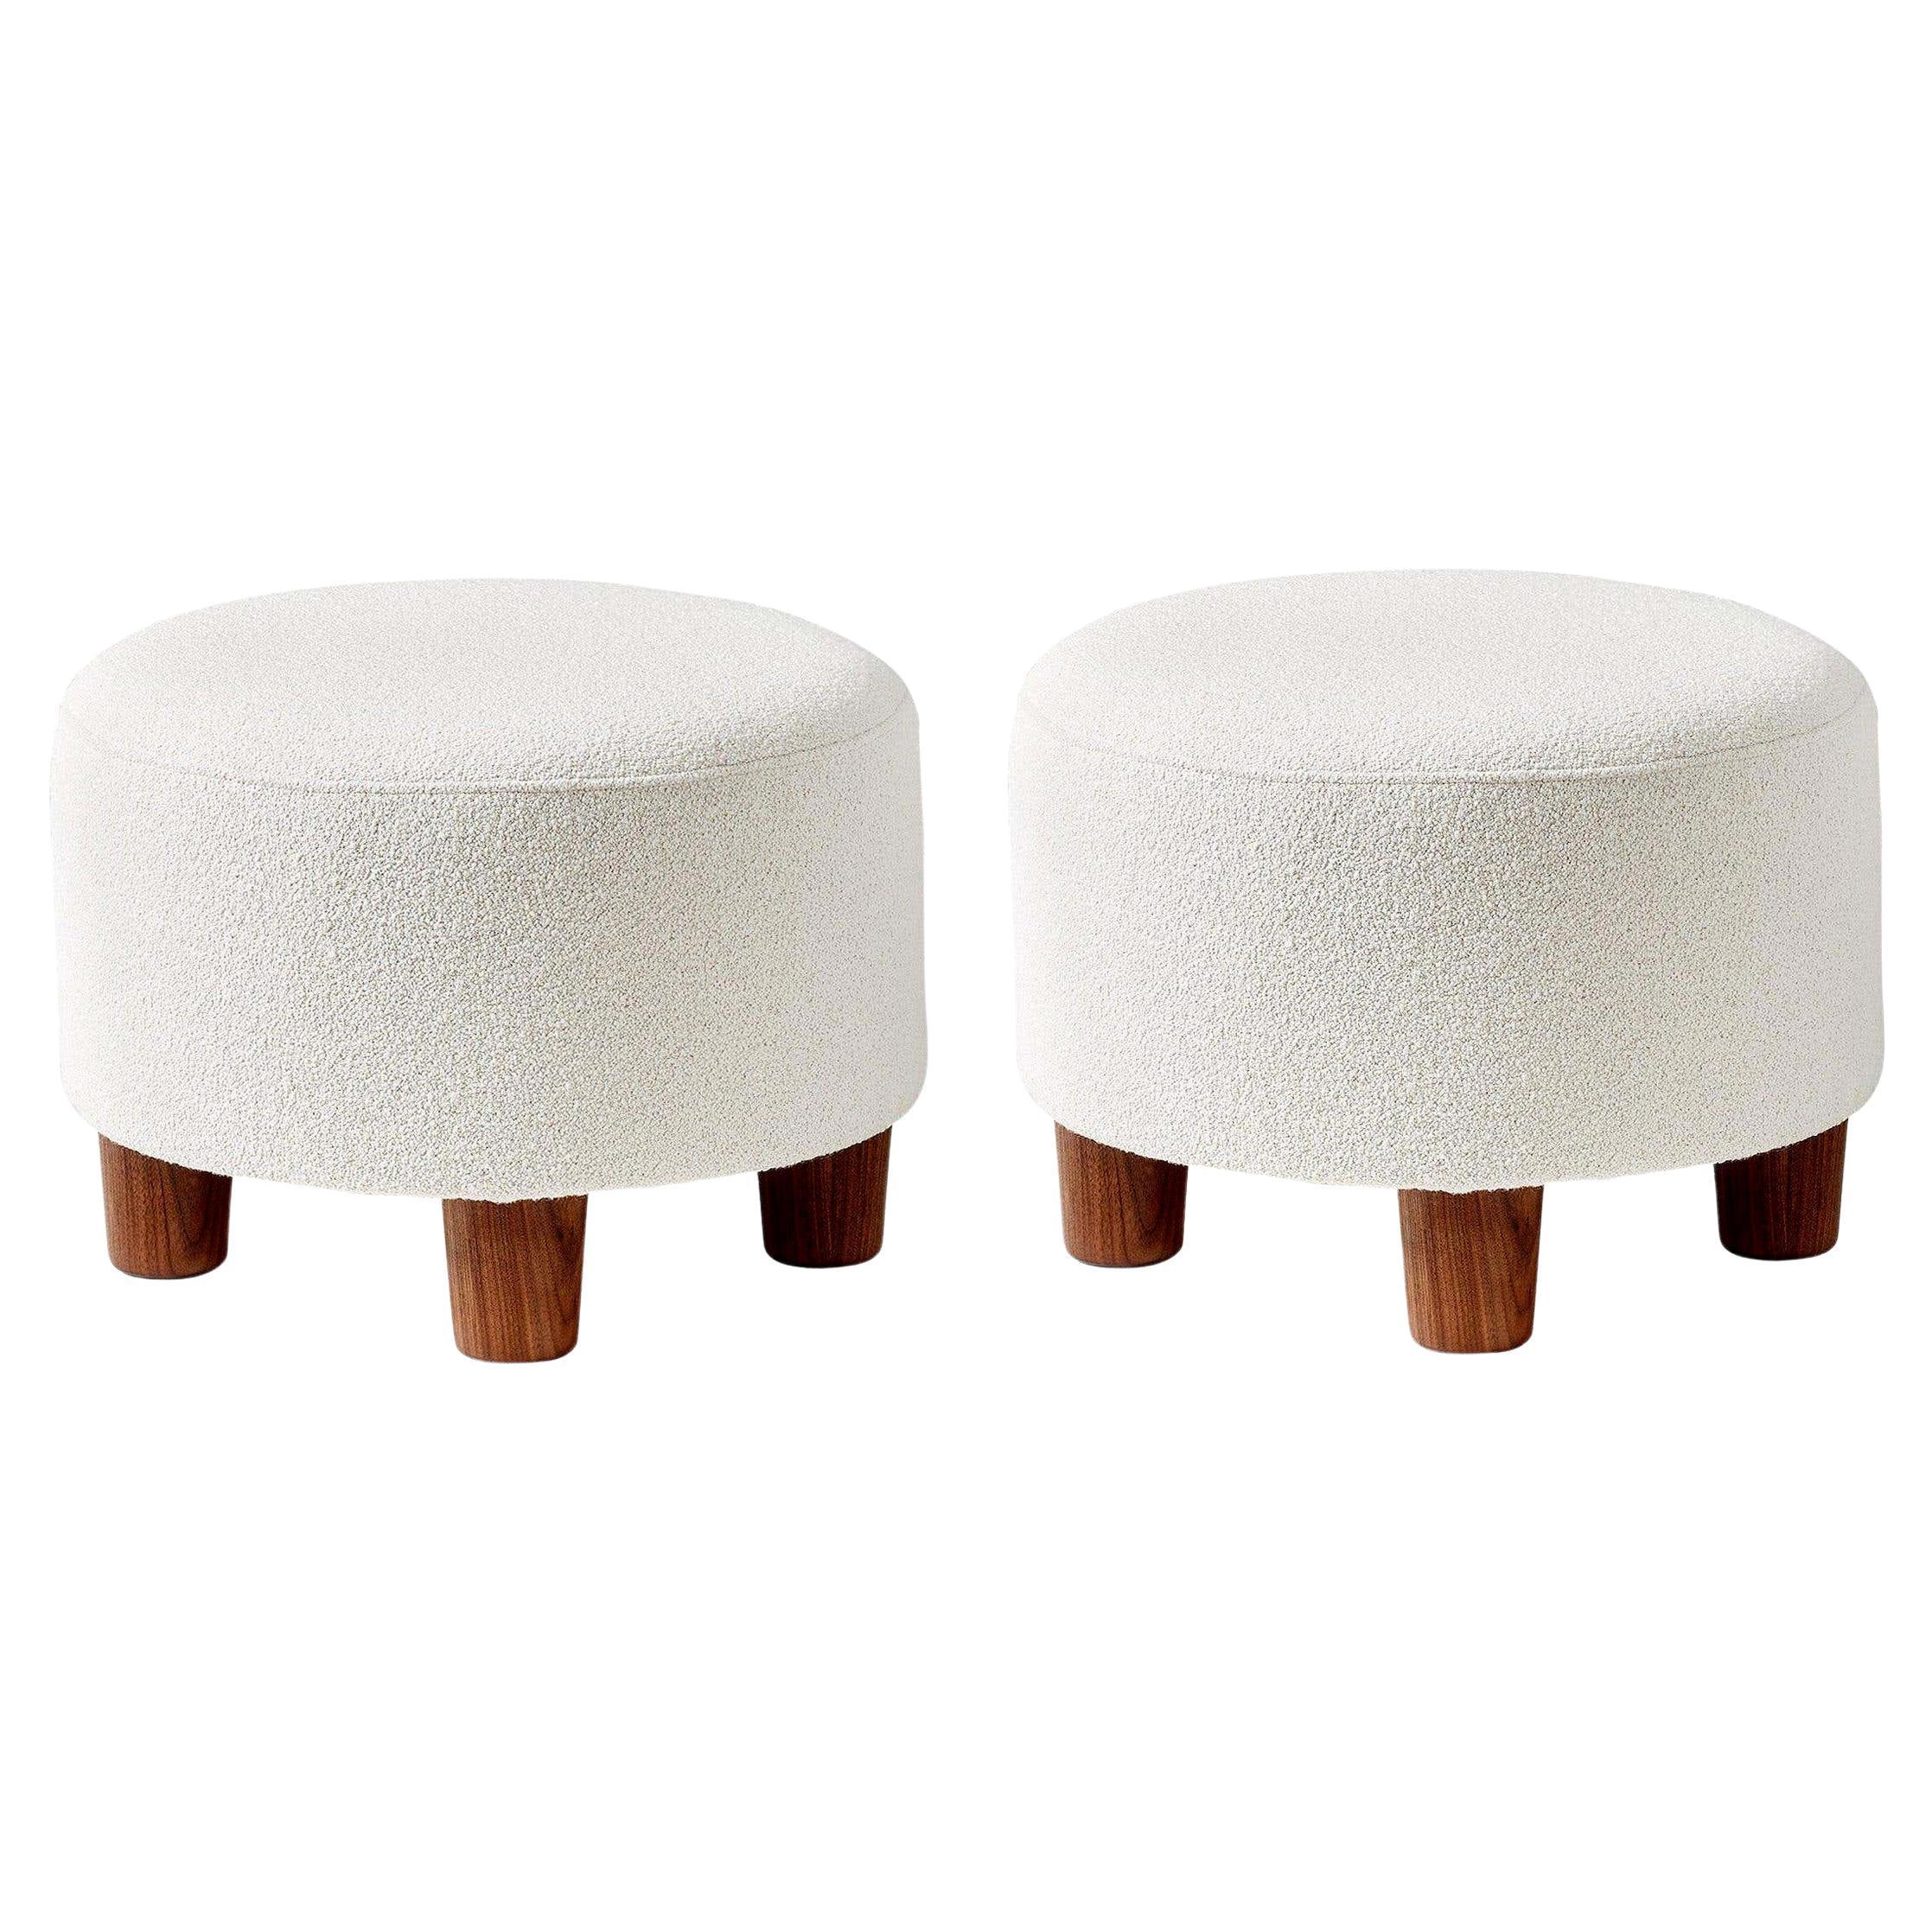 Custom Made Round Boucle Ottoman with Walnut Legs